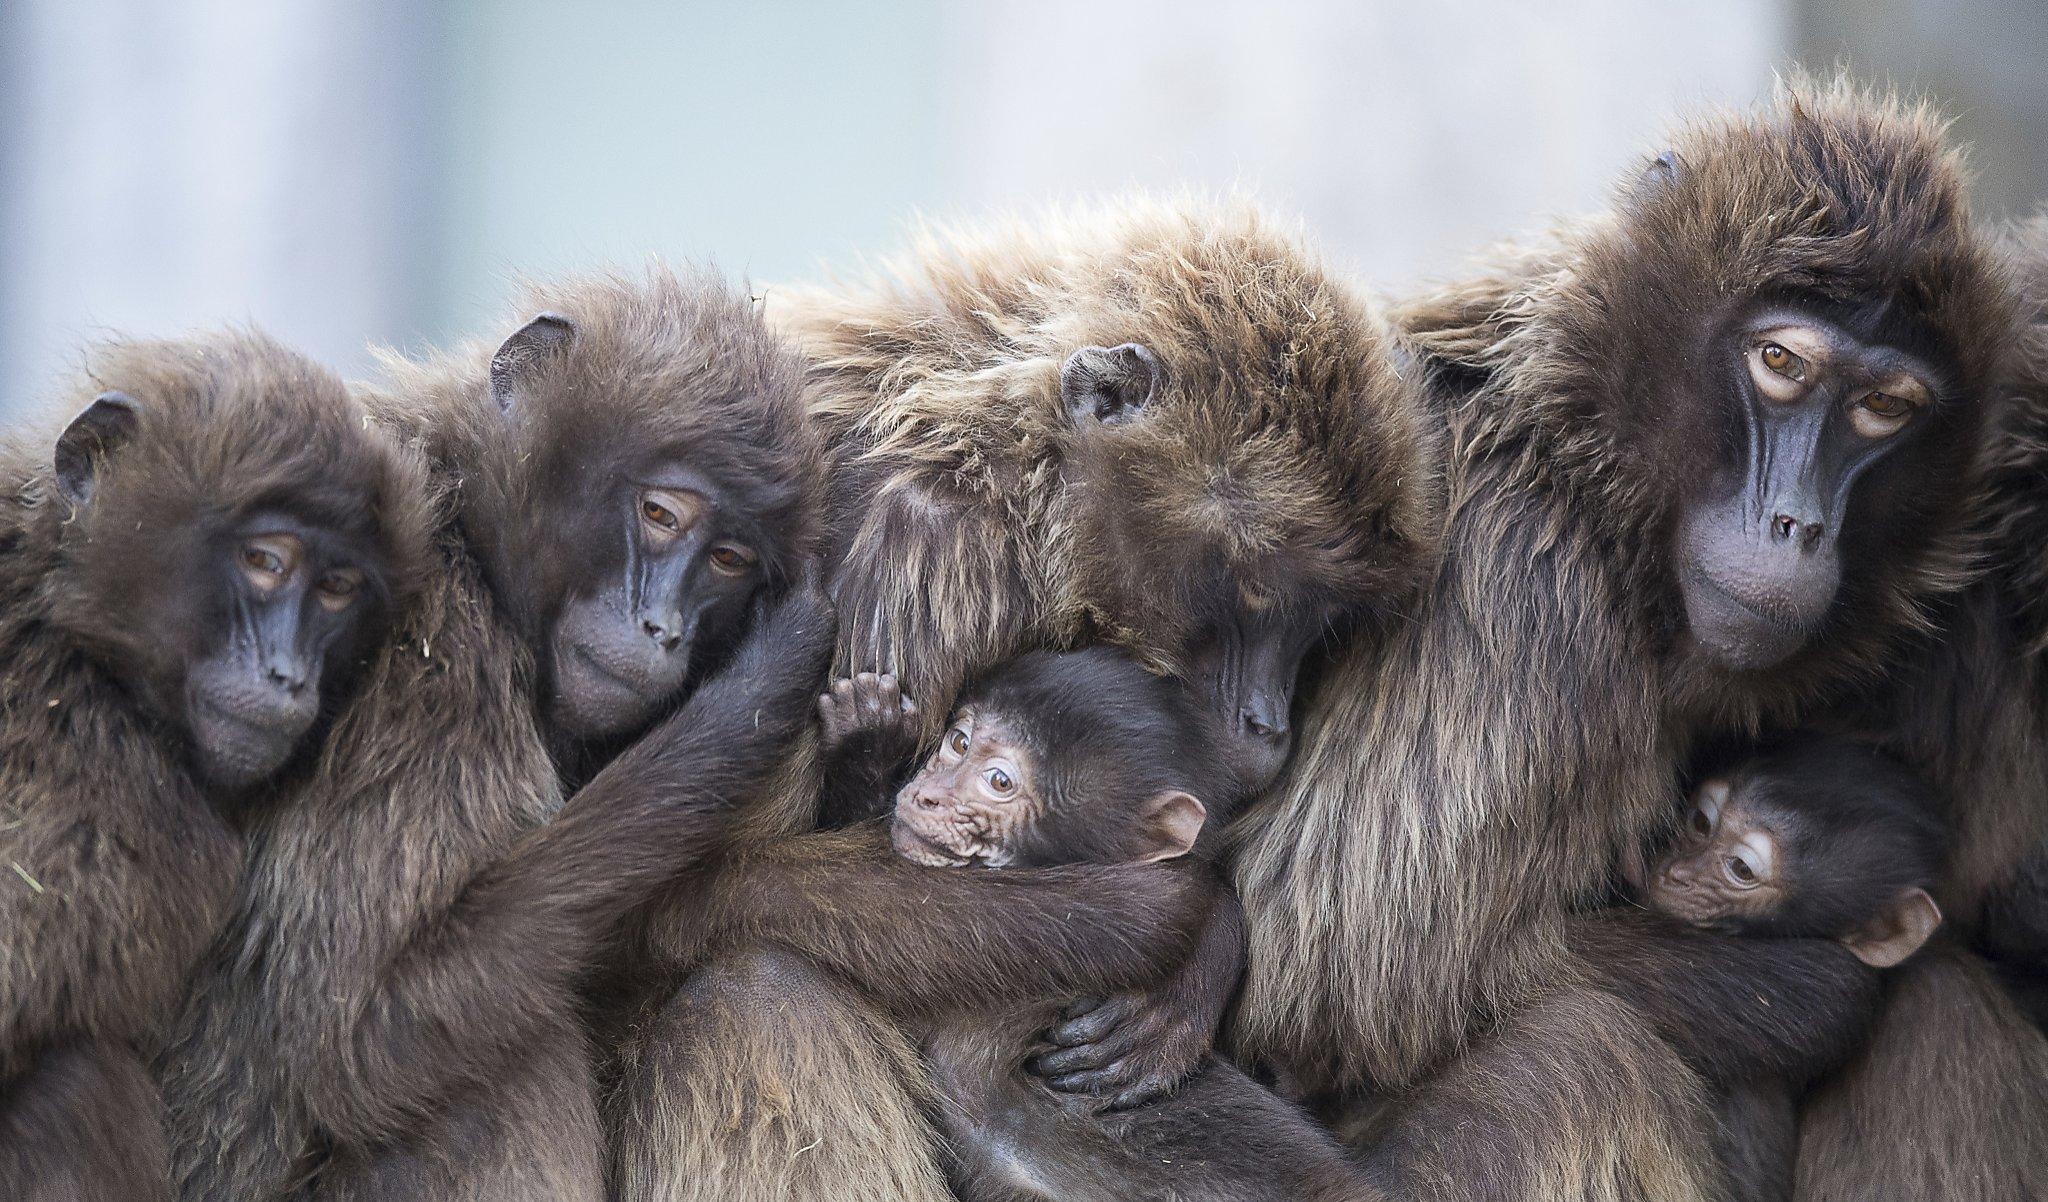 'I shot a whole family of baboons': Idaho Fish and Game